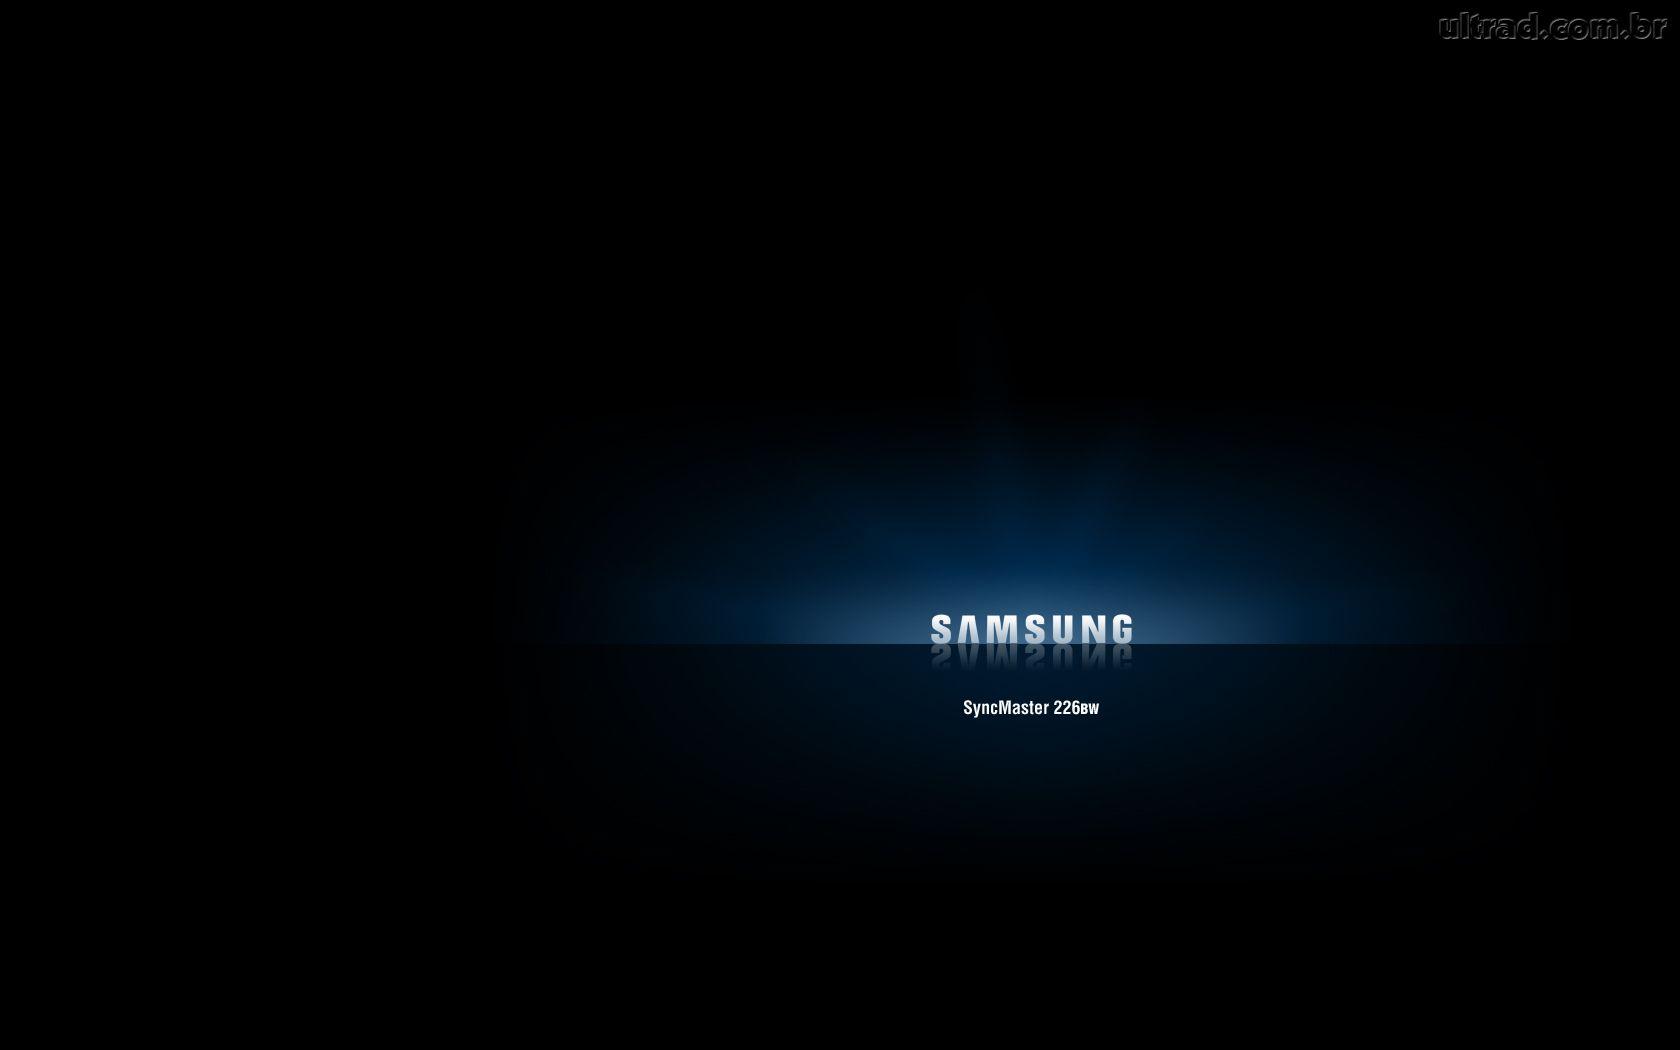 Samsung Wallpapers HD 1680x1050